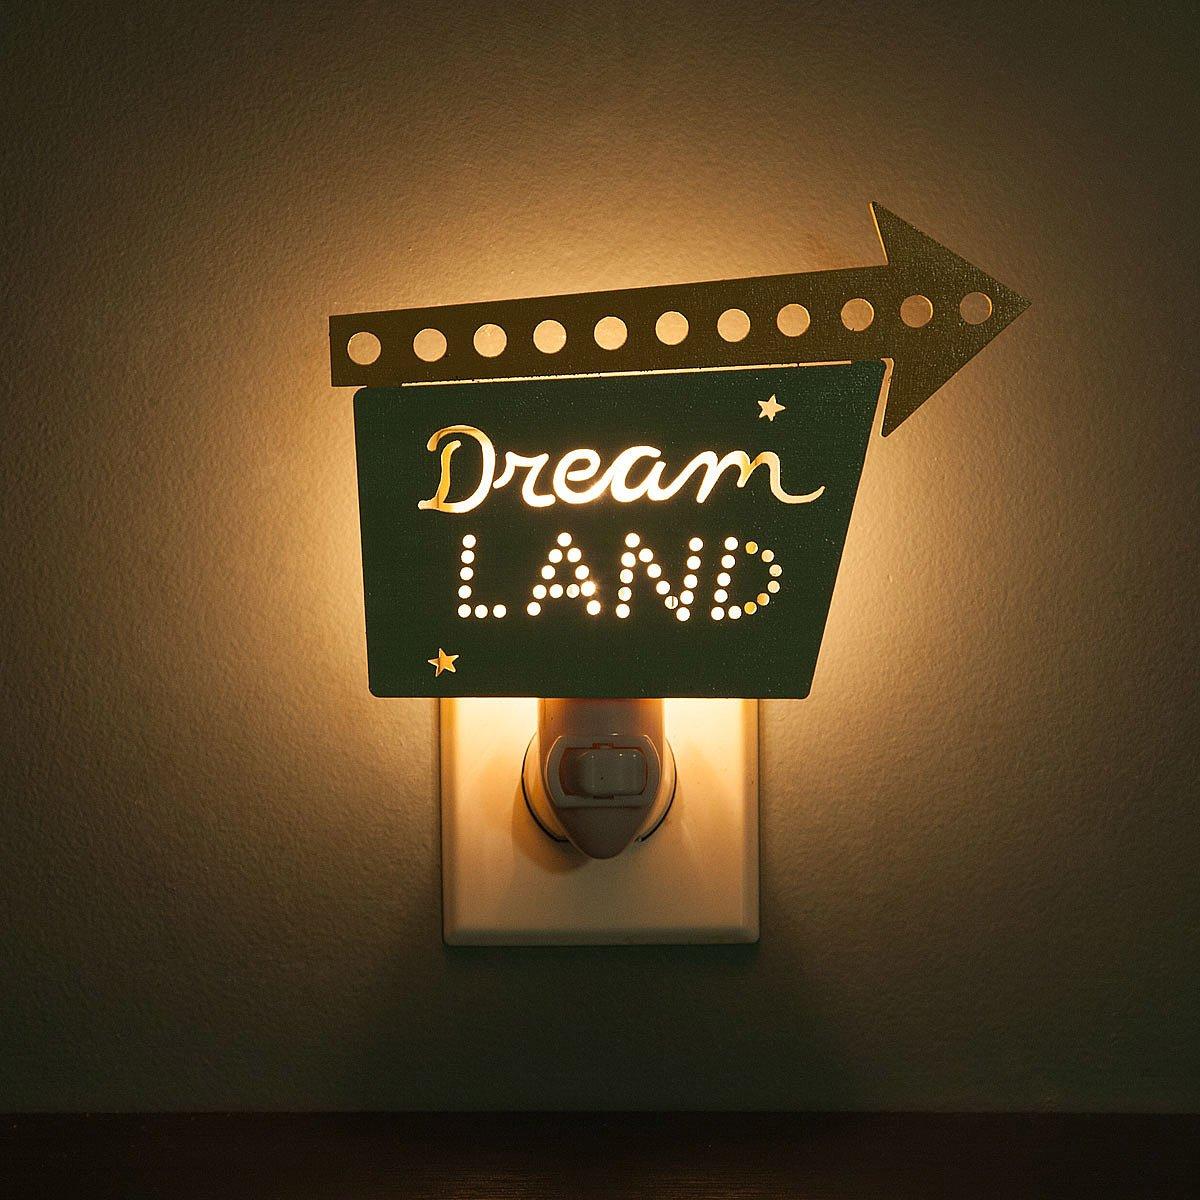 dreamland nightlight vintage nightlight retro nightlight diner. Black Bedroom Furniture Sets. Home Design Ideas